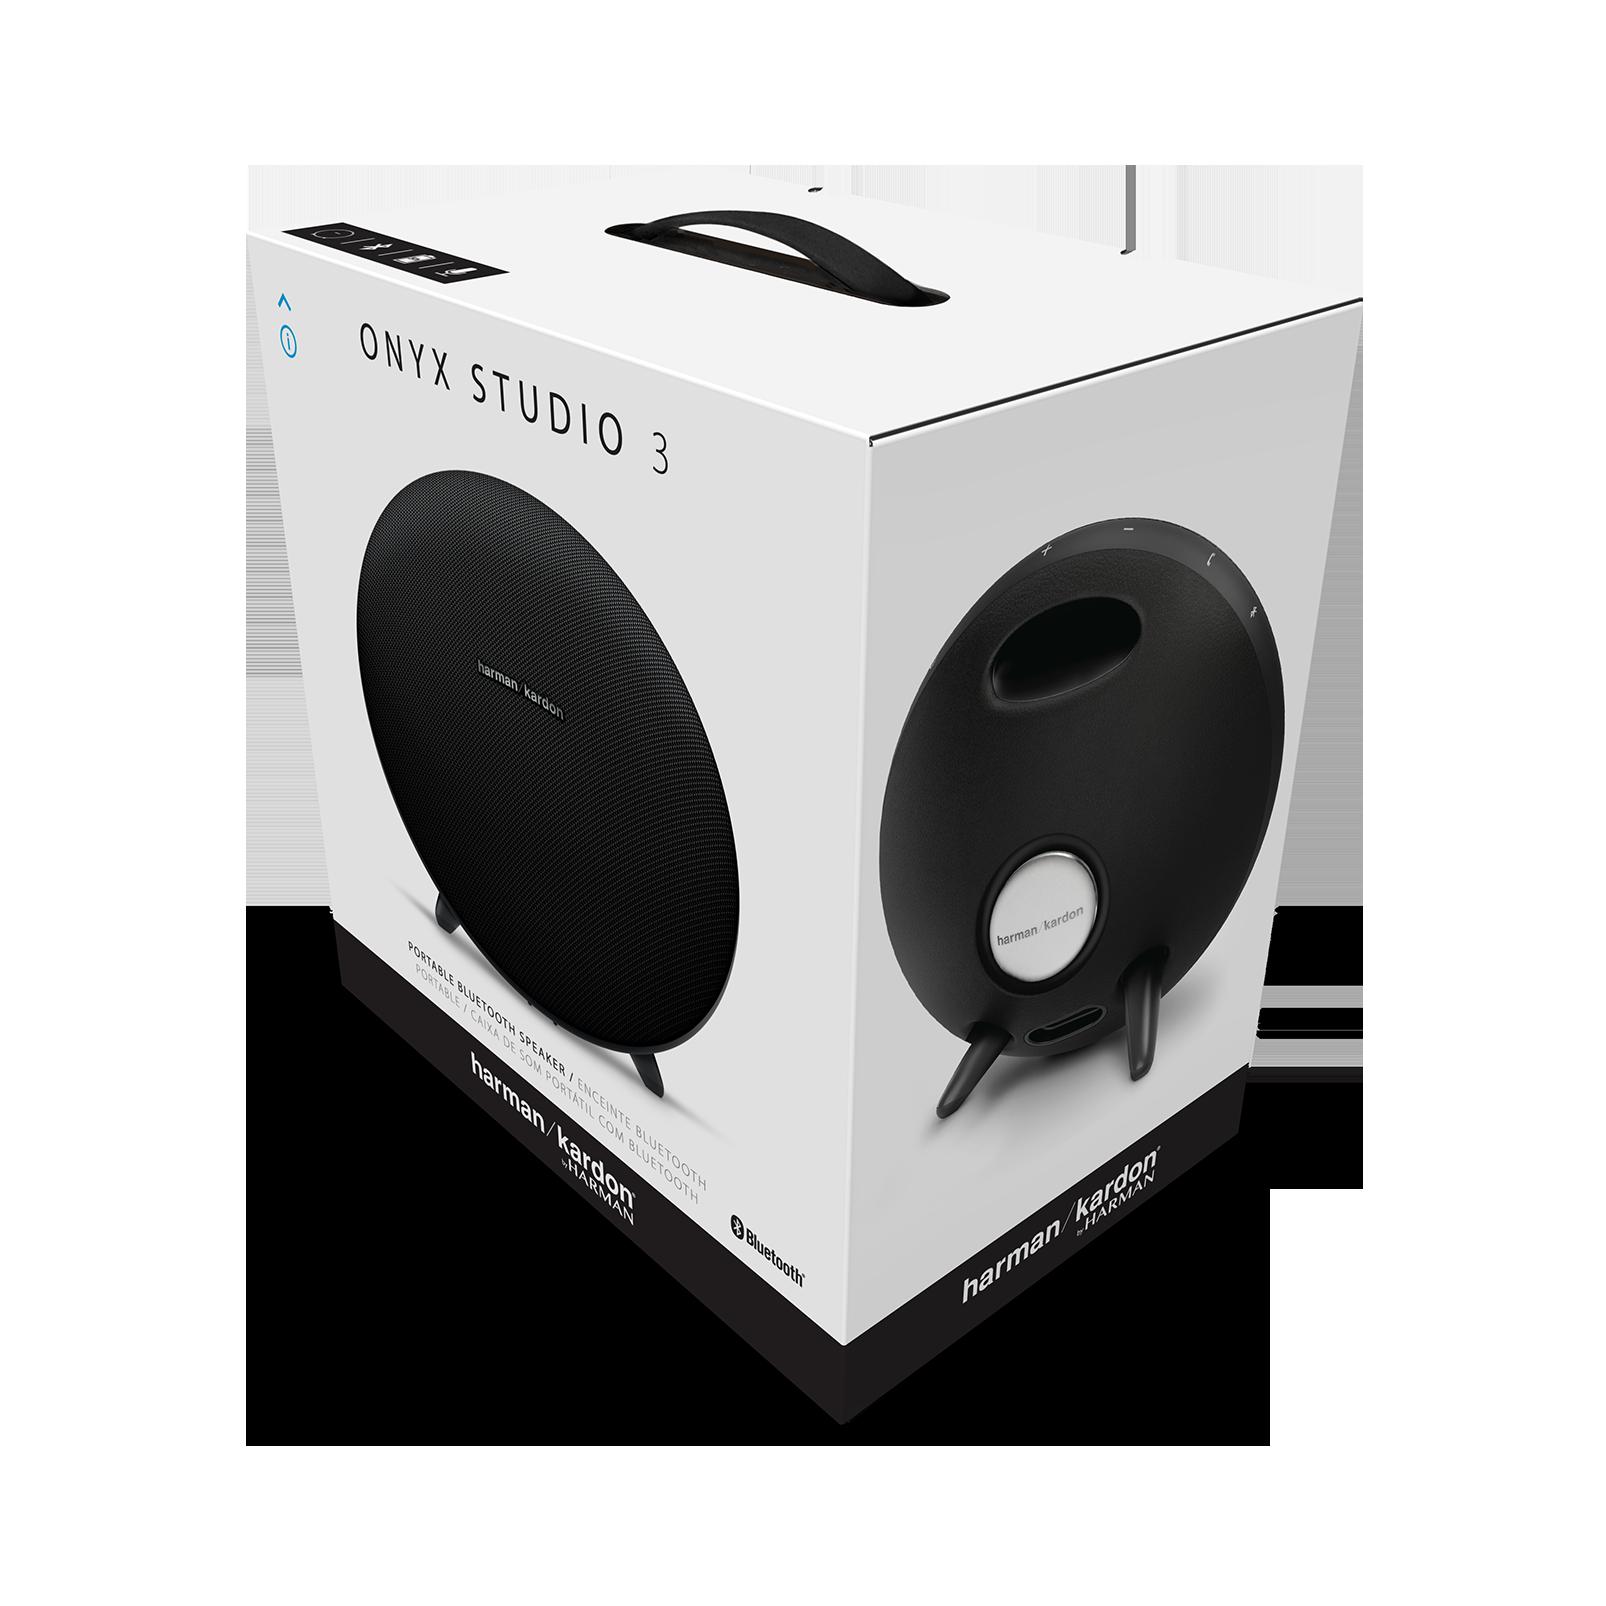 Harman Kardon Onyx Studio 3 Portable Bluetooth Speaker Refurbished $84.99 Shipped